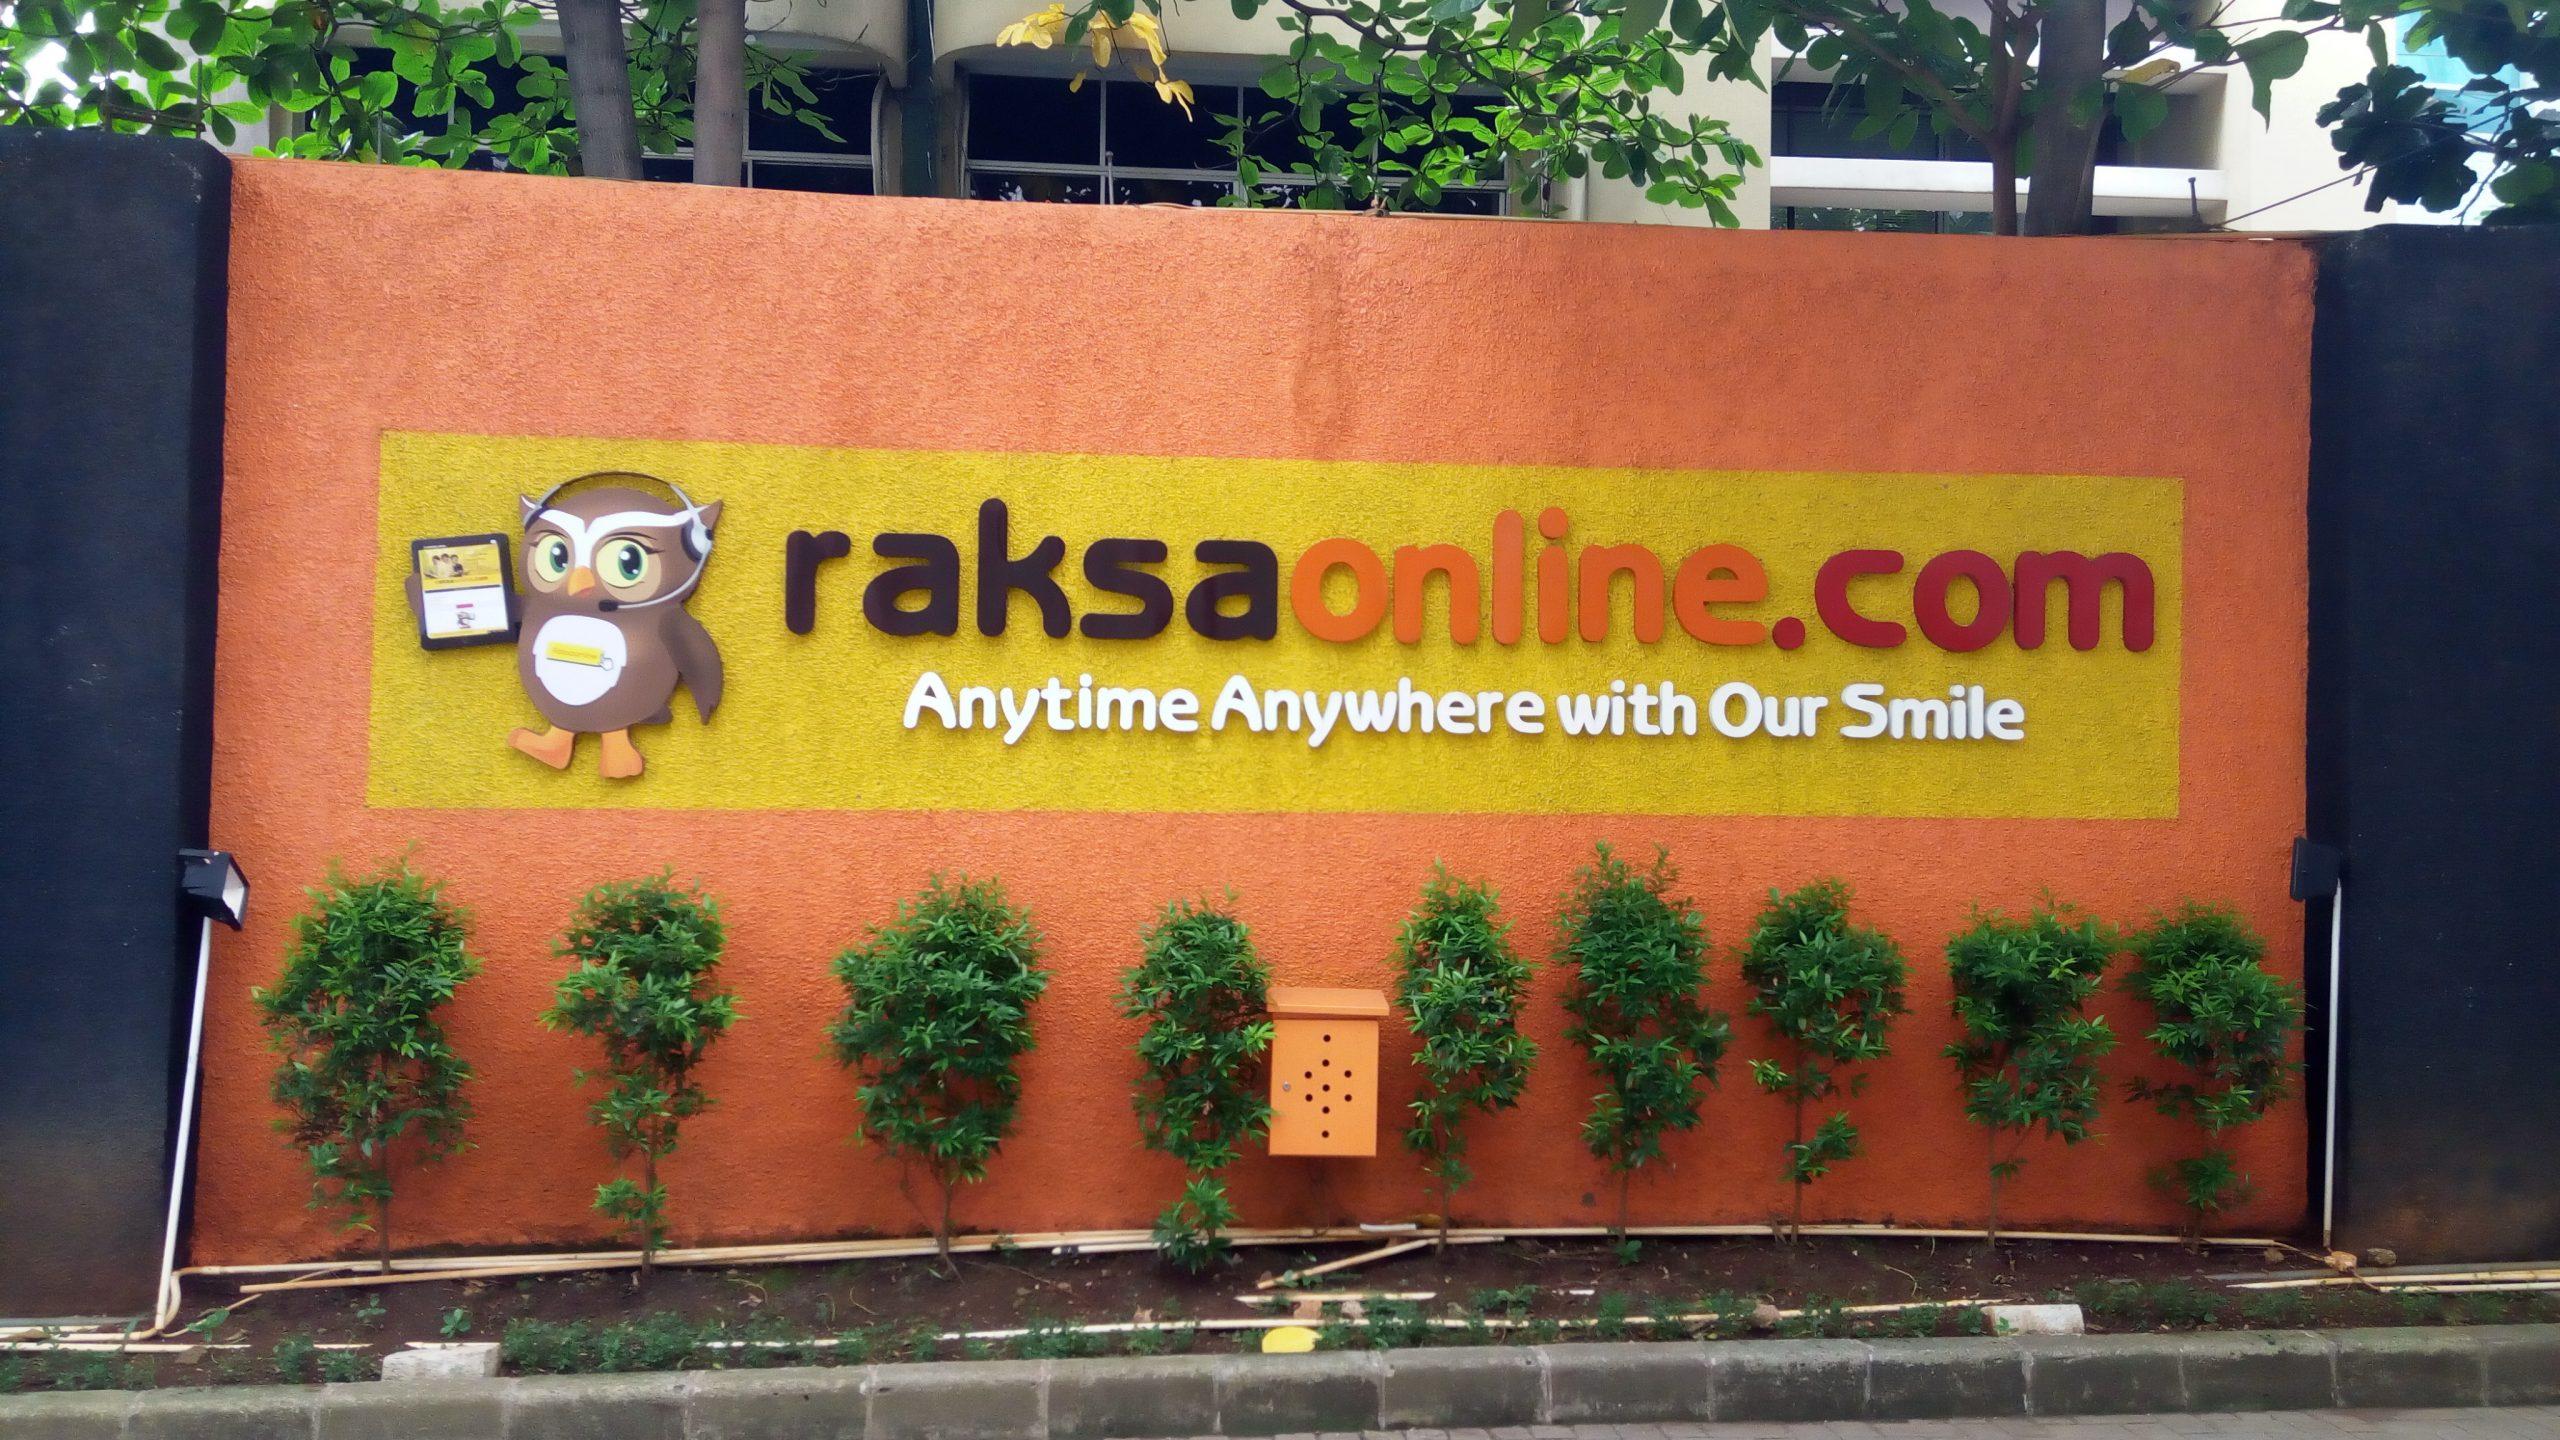 Asuransi Dengan Senyum? Raksa Online Aja!